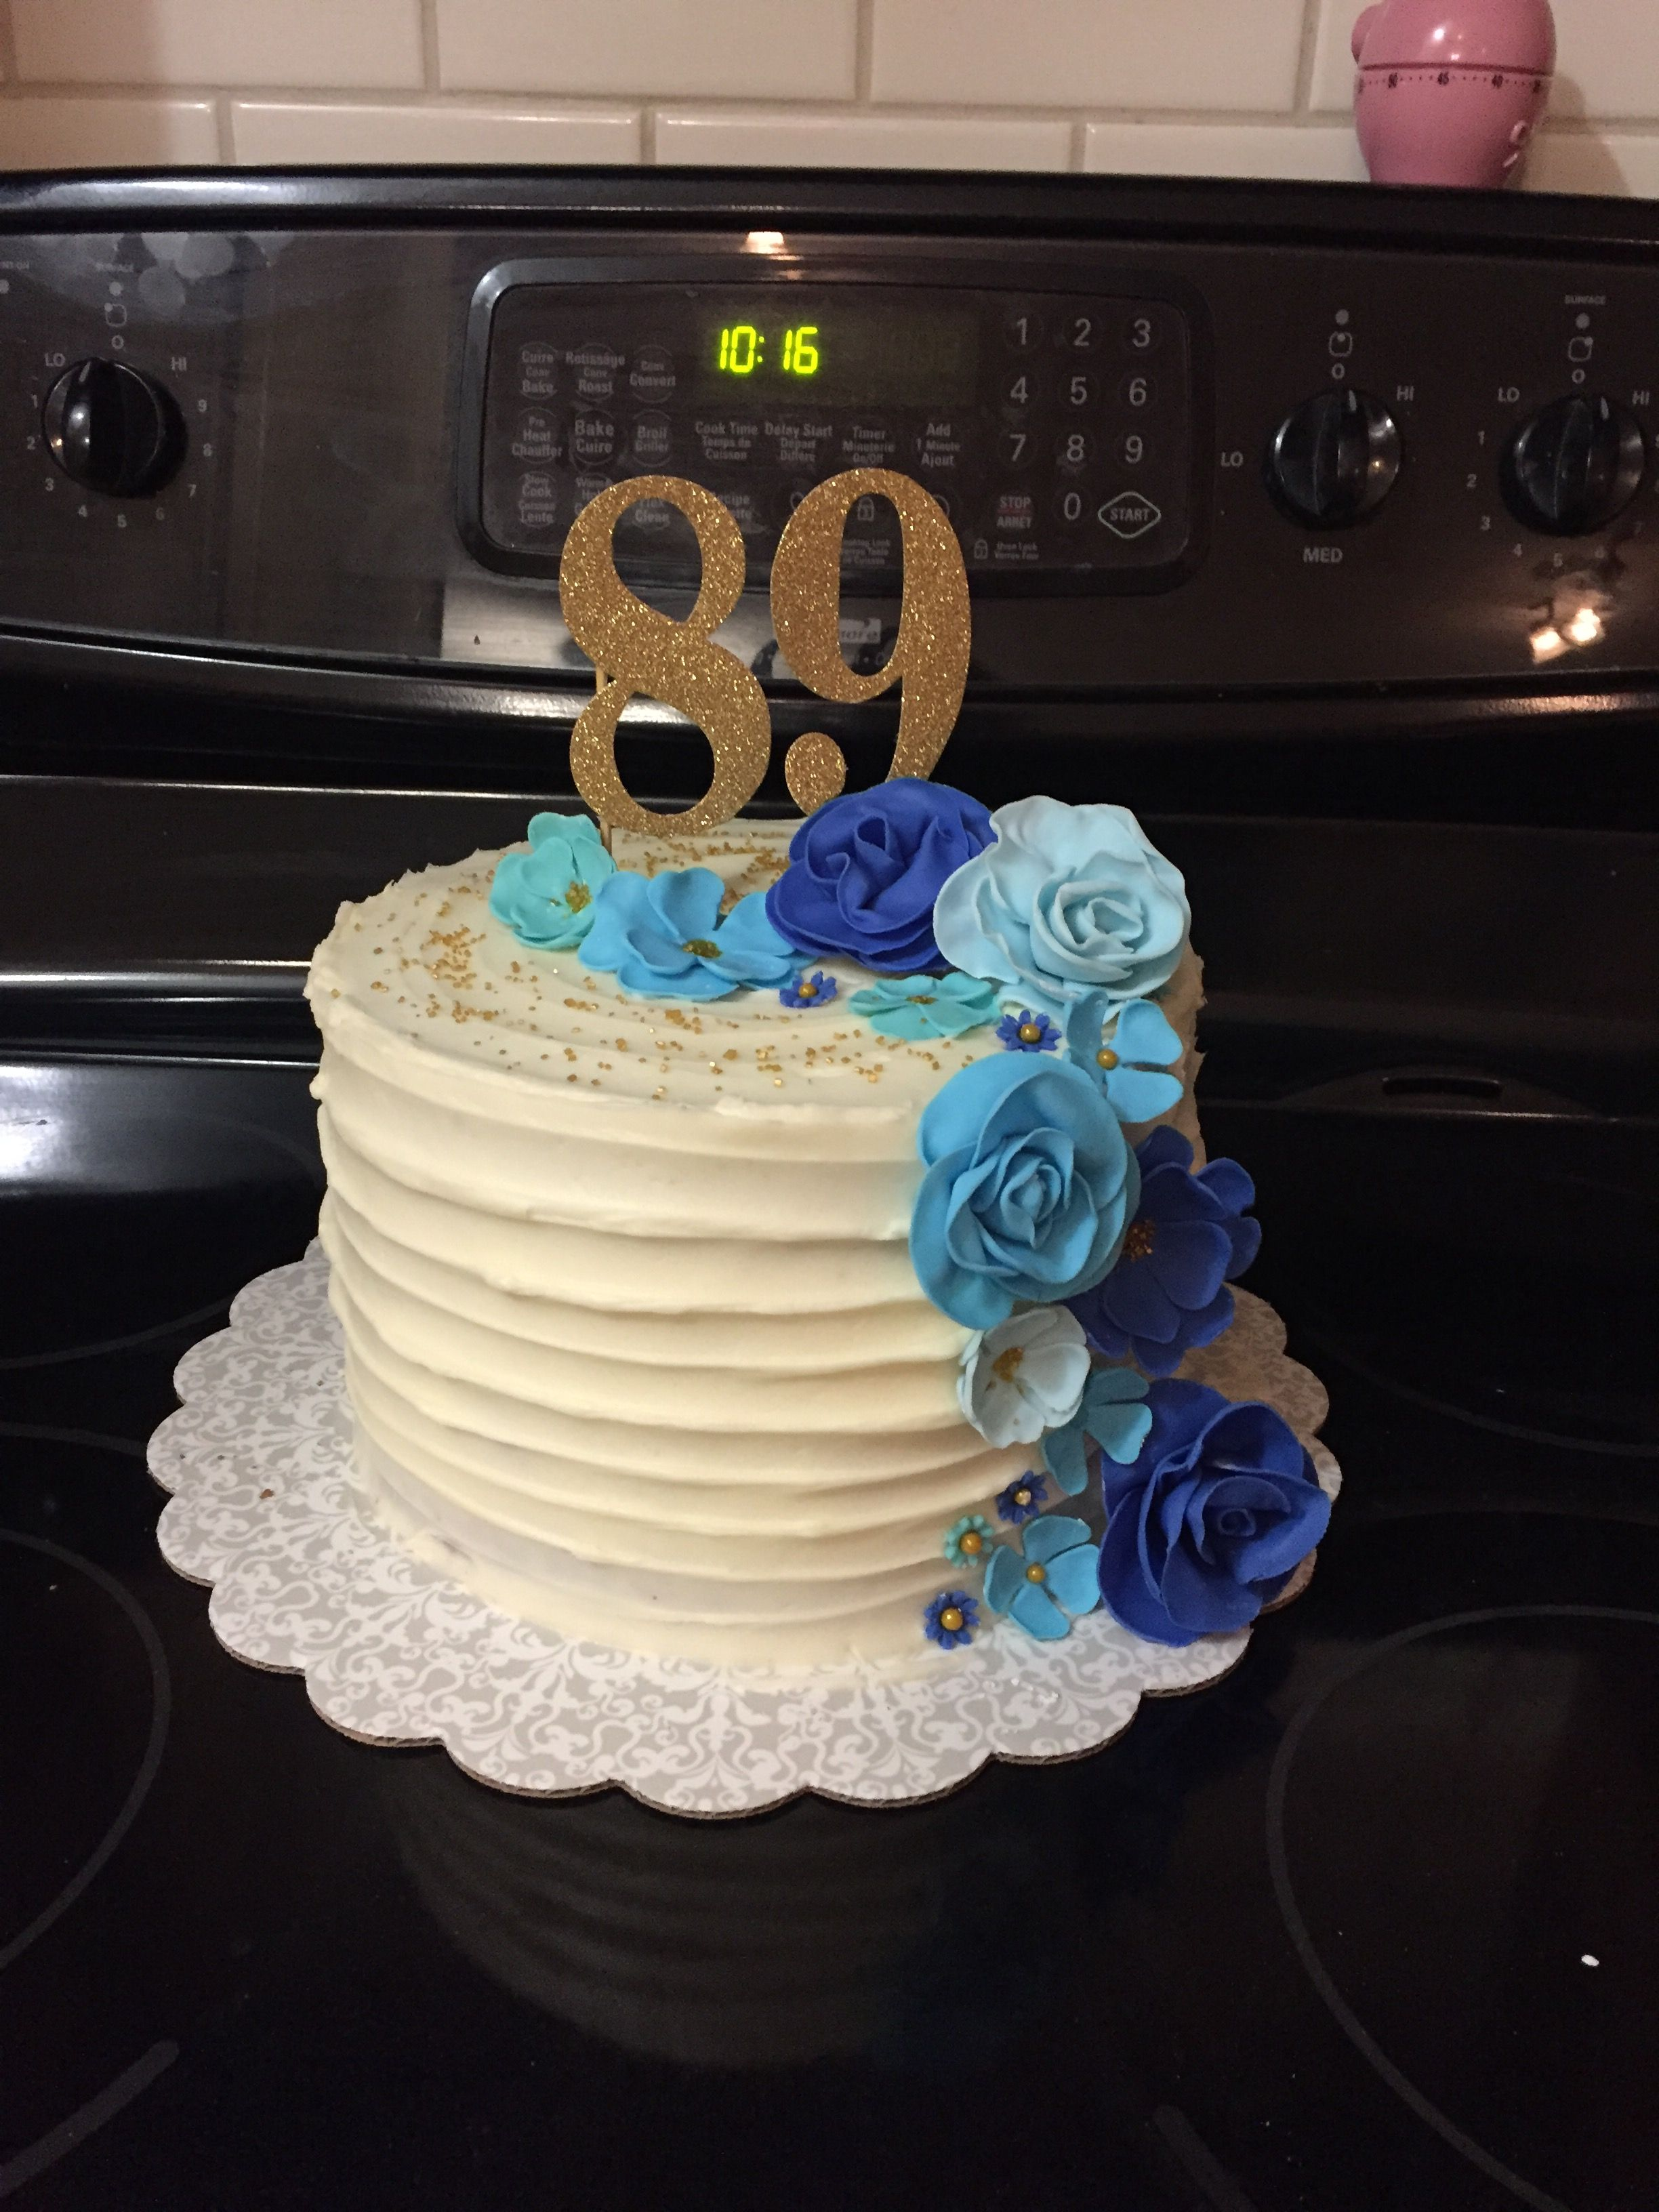 89th Birthday Cake Cakes Pinterest Birthday Cakes Cake And